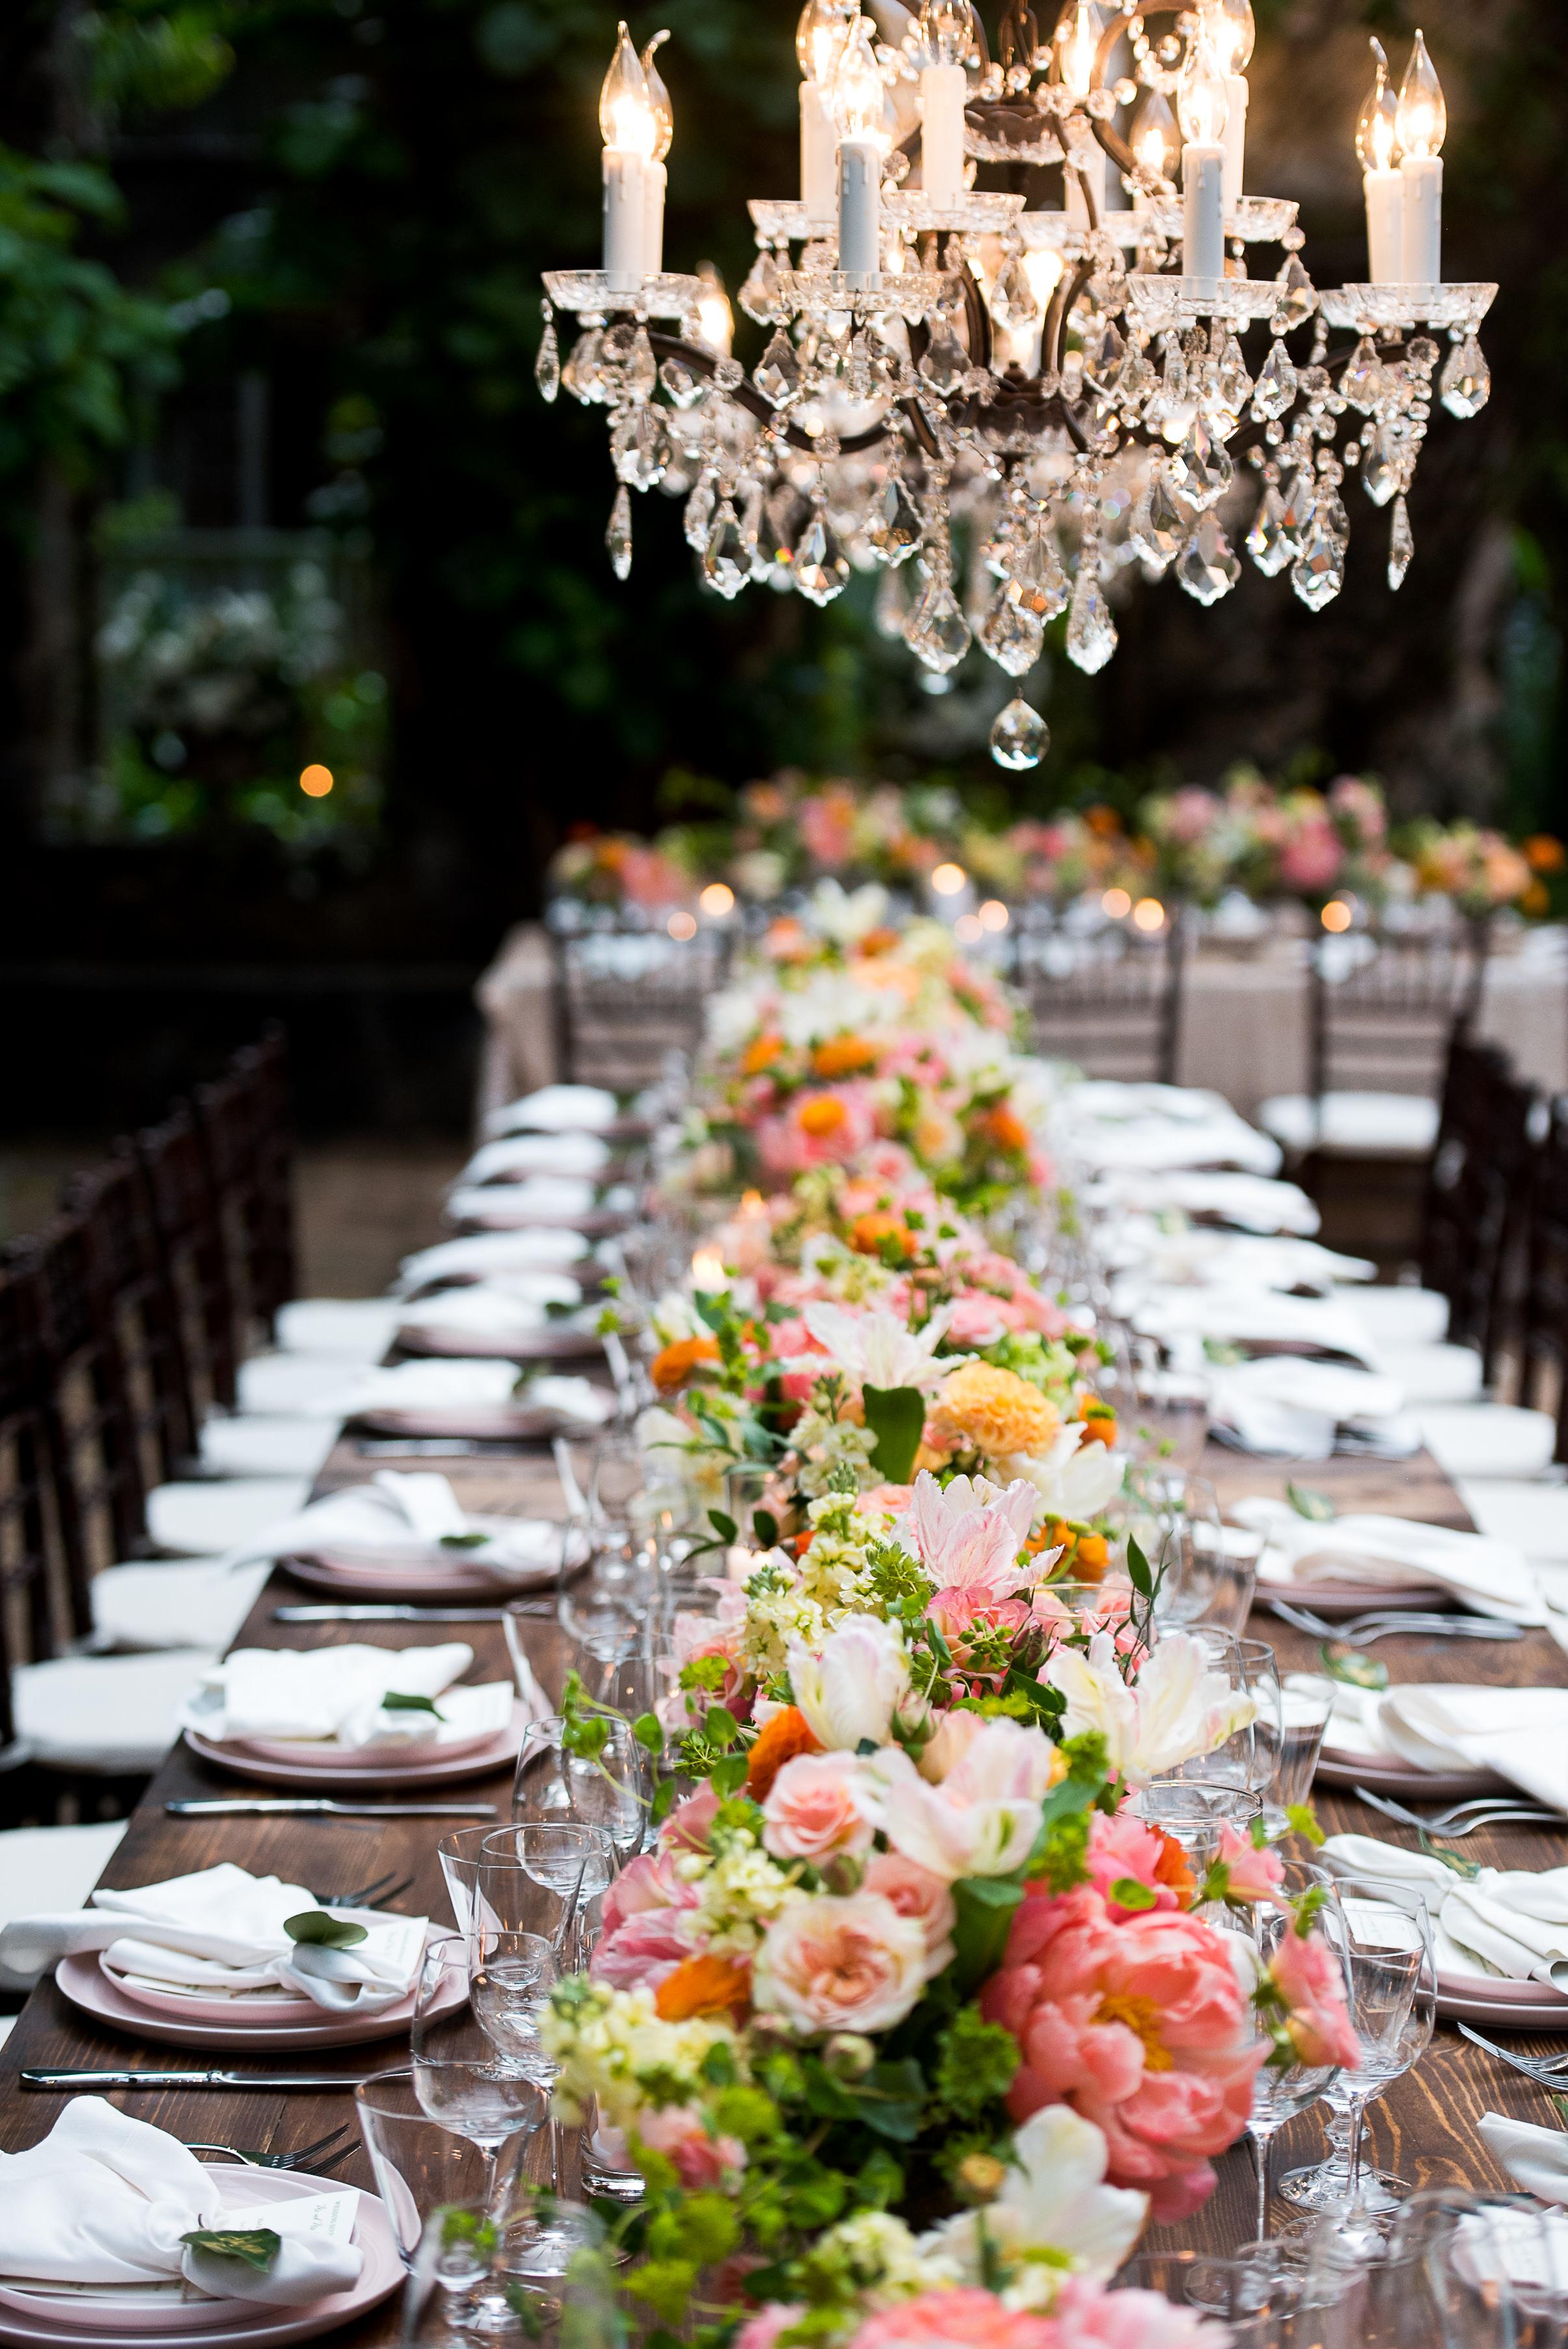 160507-Shaila-Wedding-4554.jpg